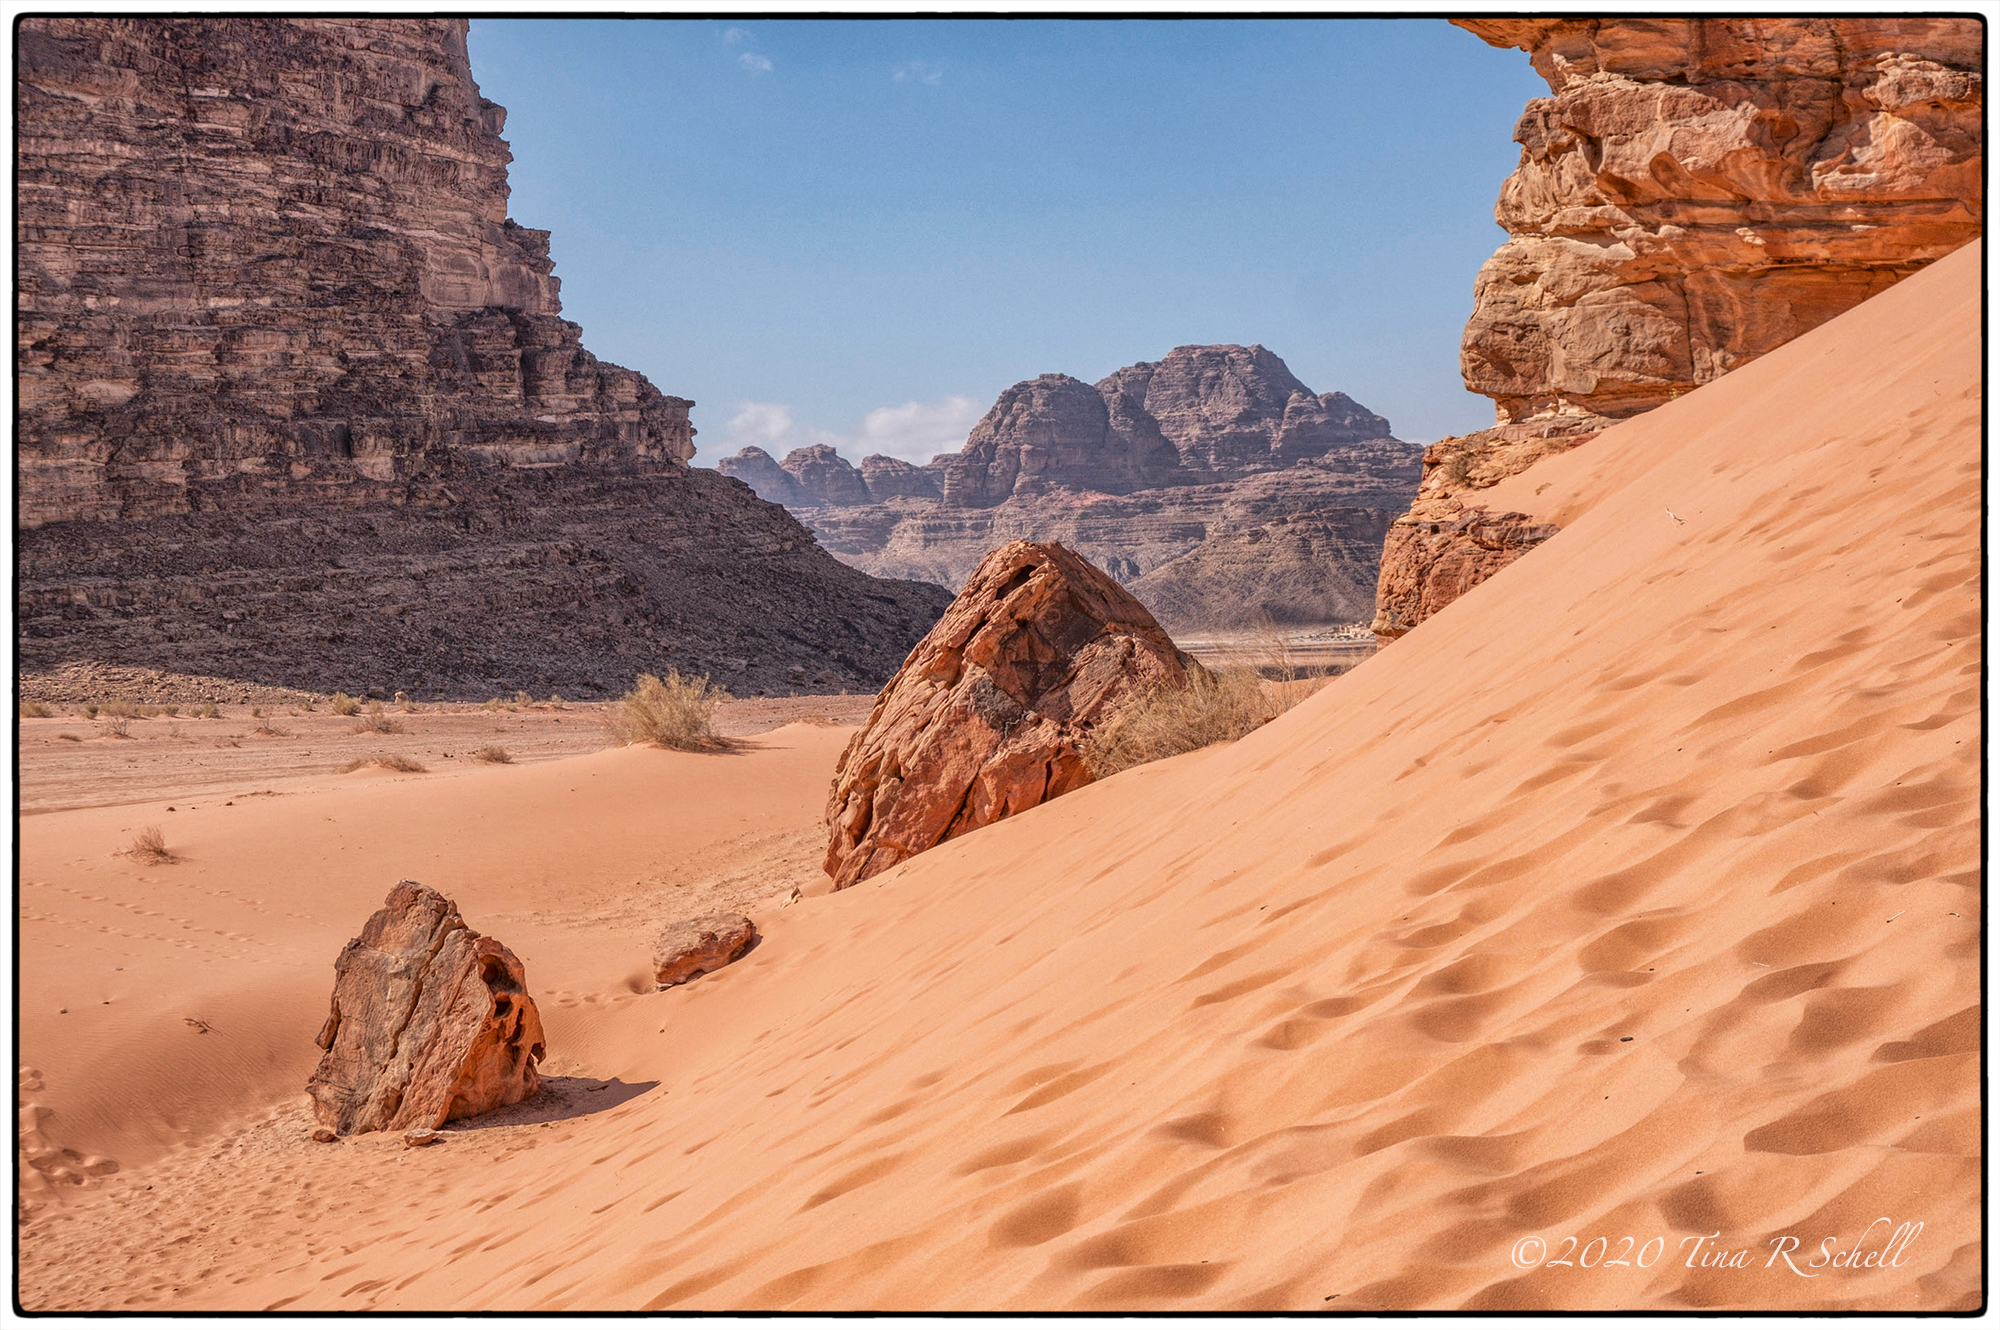 desert, landscape, sand, rock